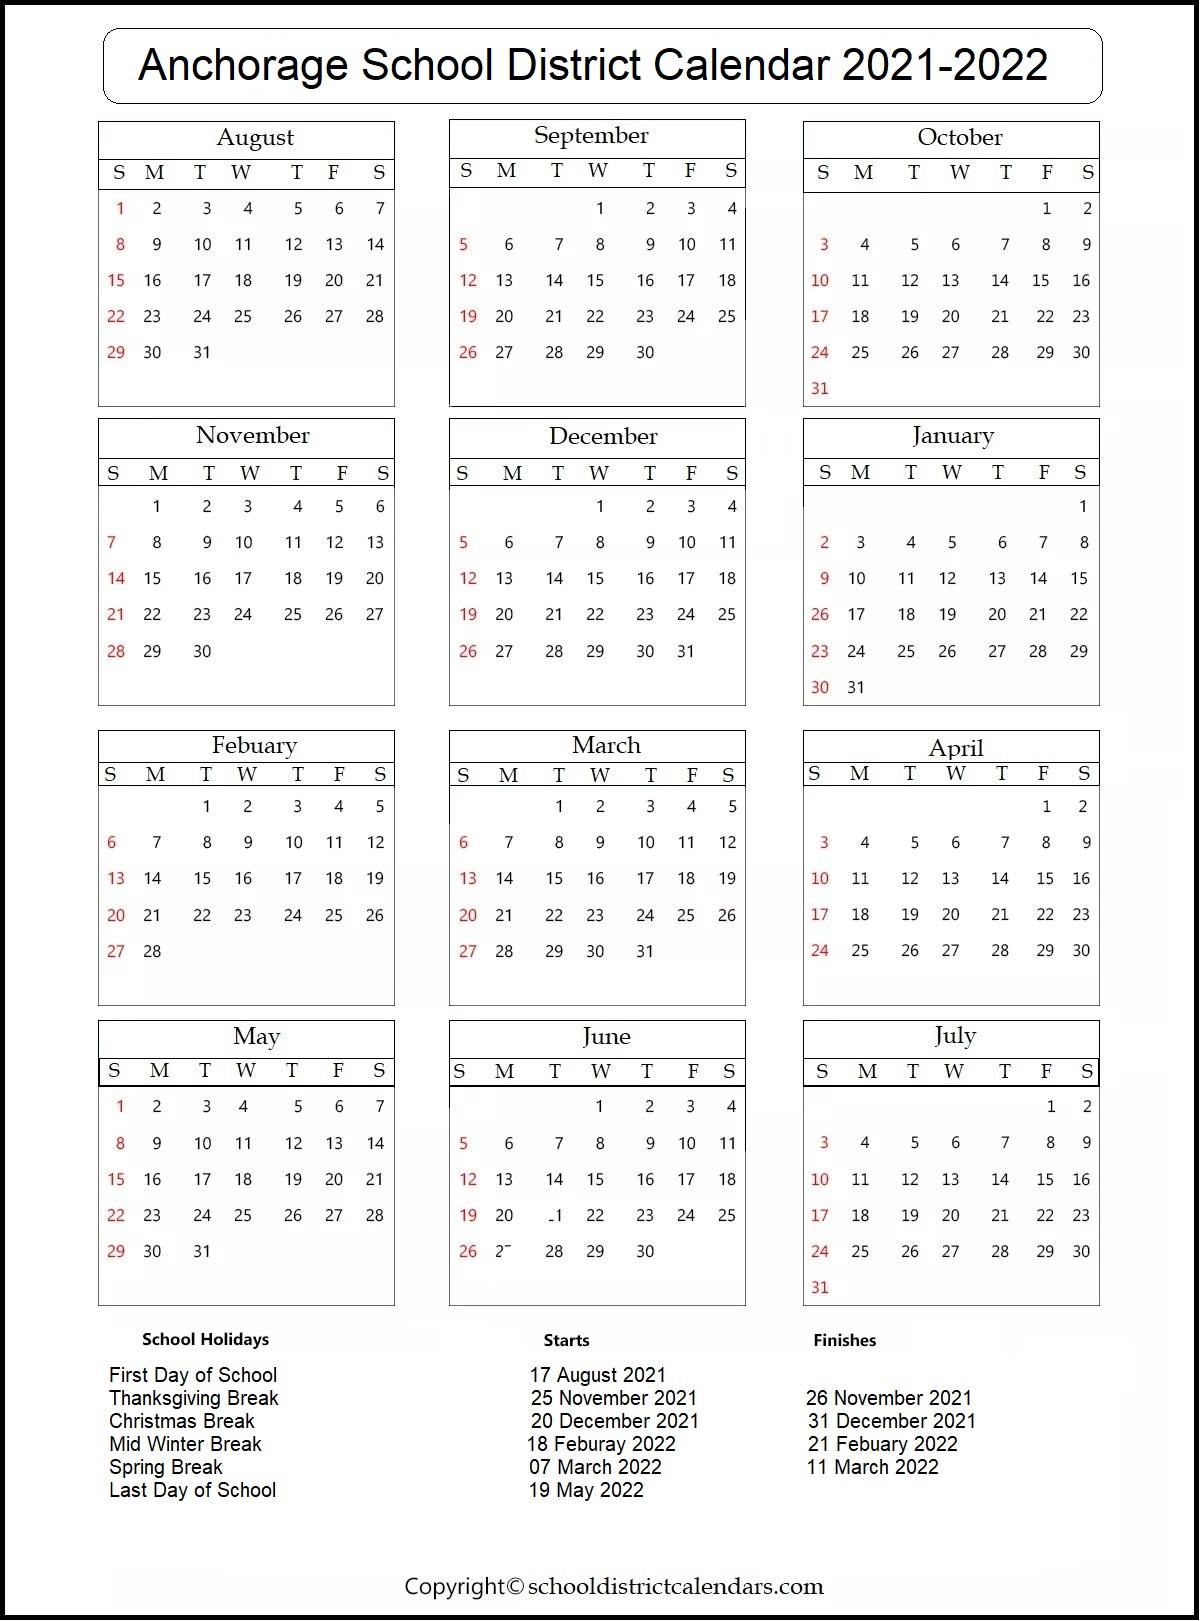 Anchorage School District Calendar 2021-2022